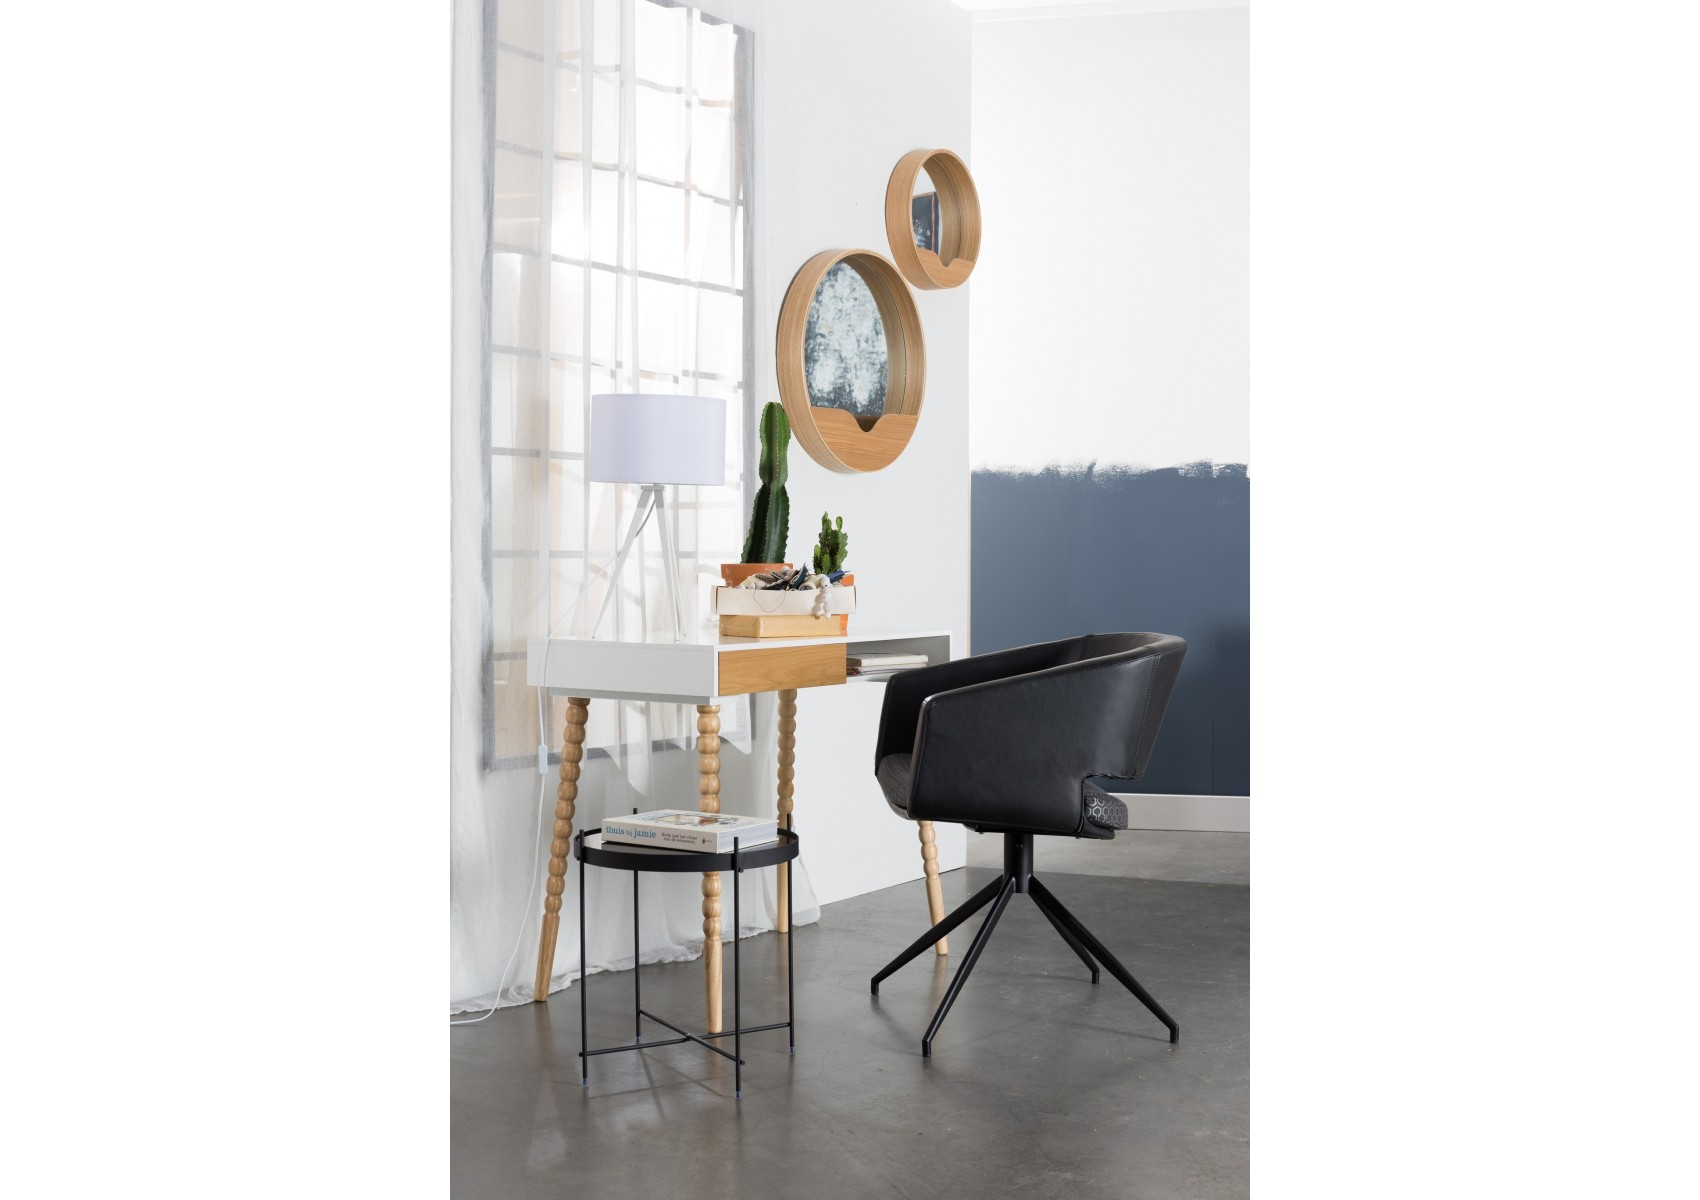 Miroir ROUND WALL Boite à design